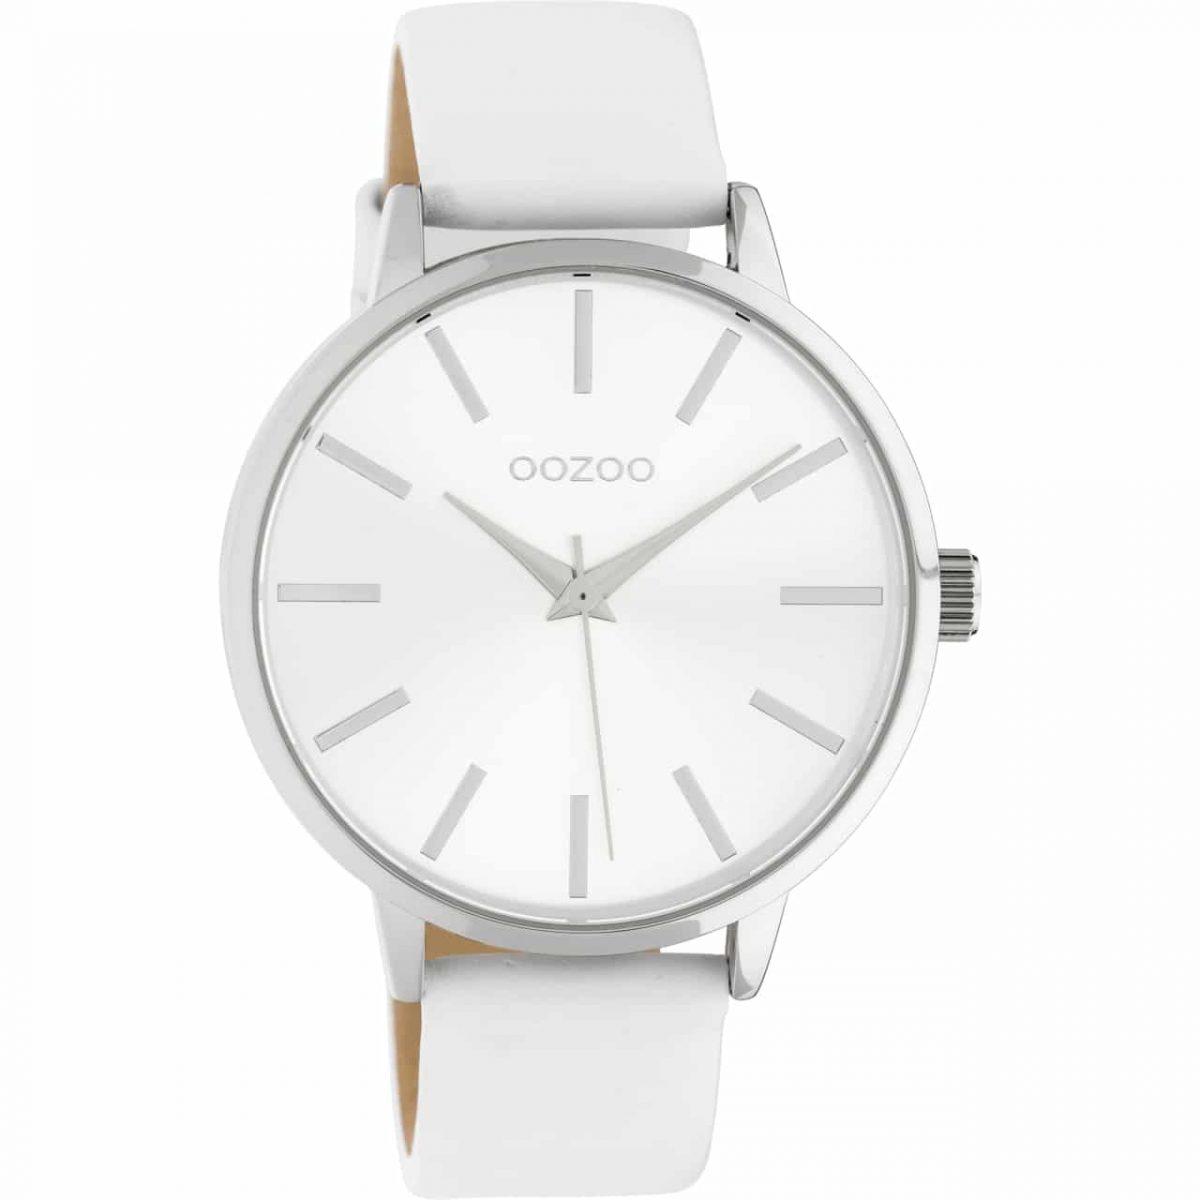 Timepieces Summer 2020 - C10610 - OOZOO